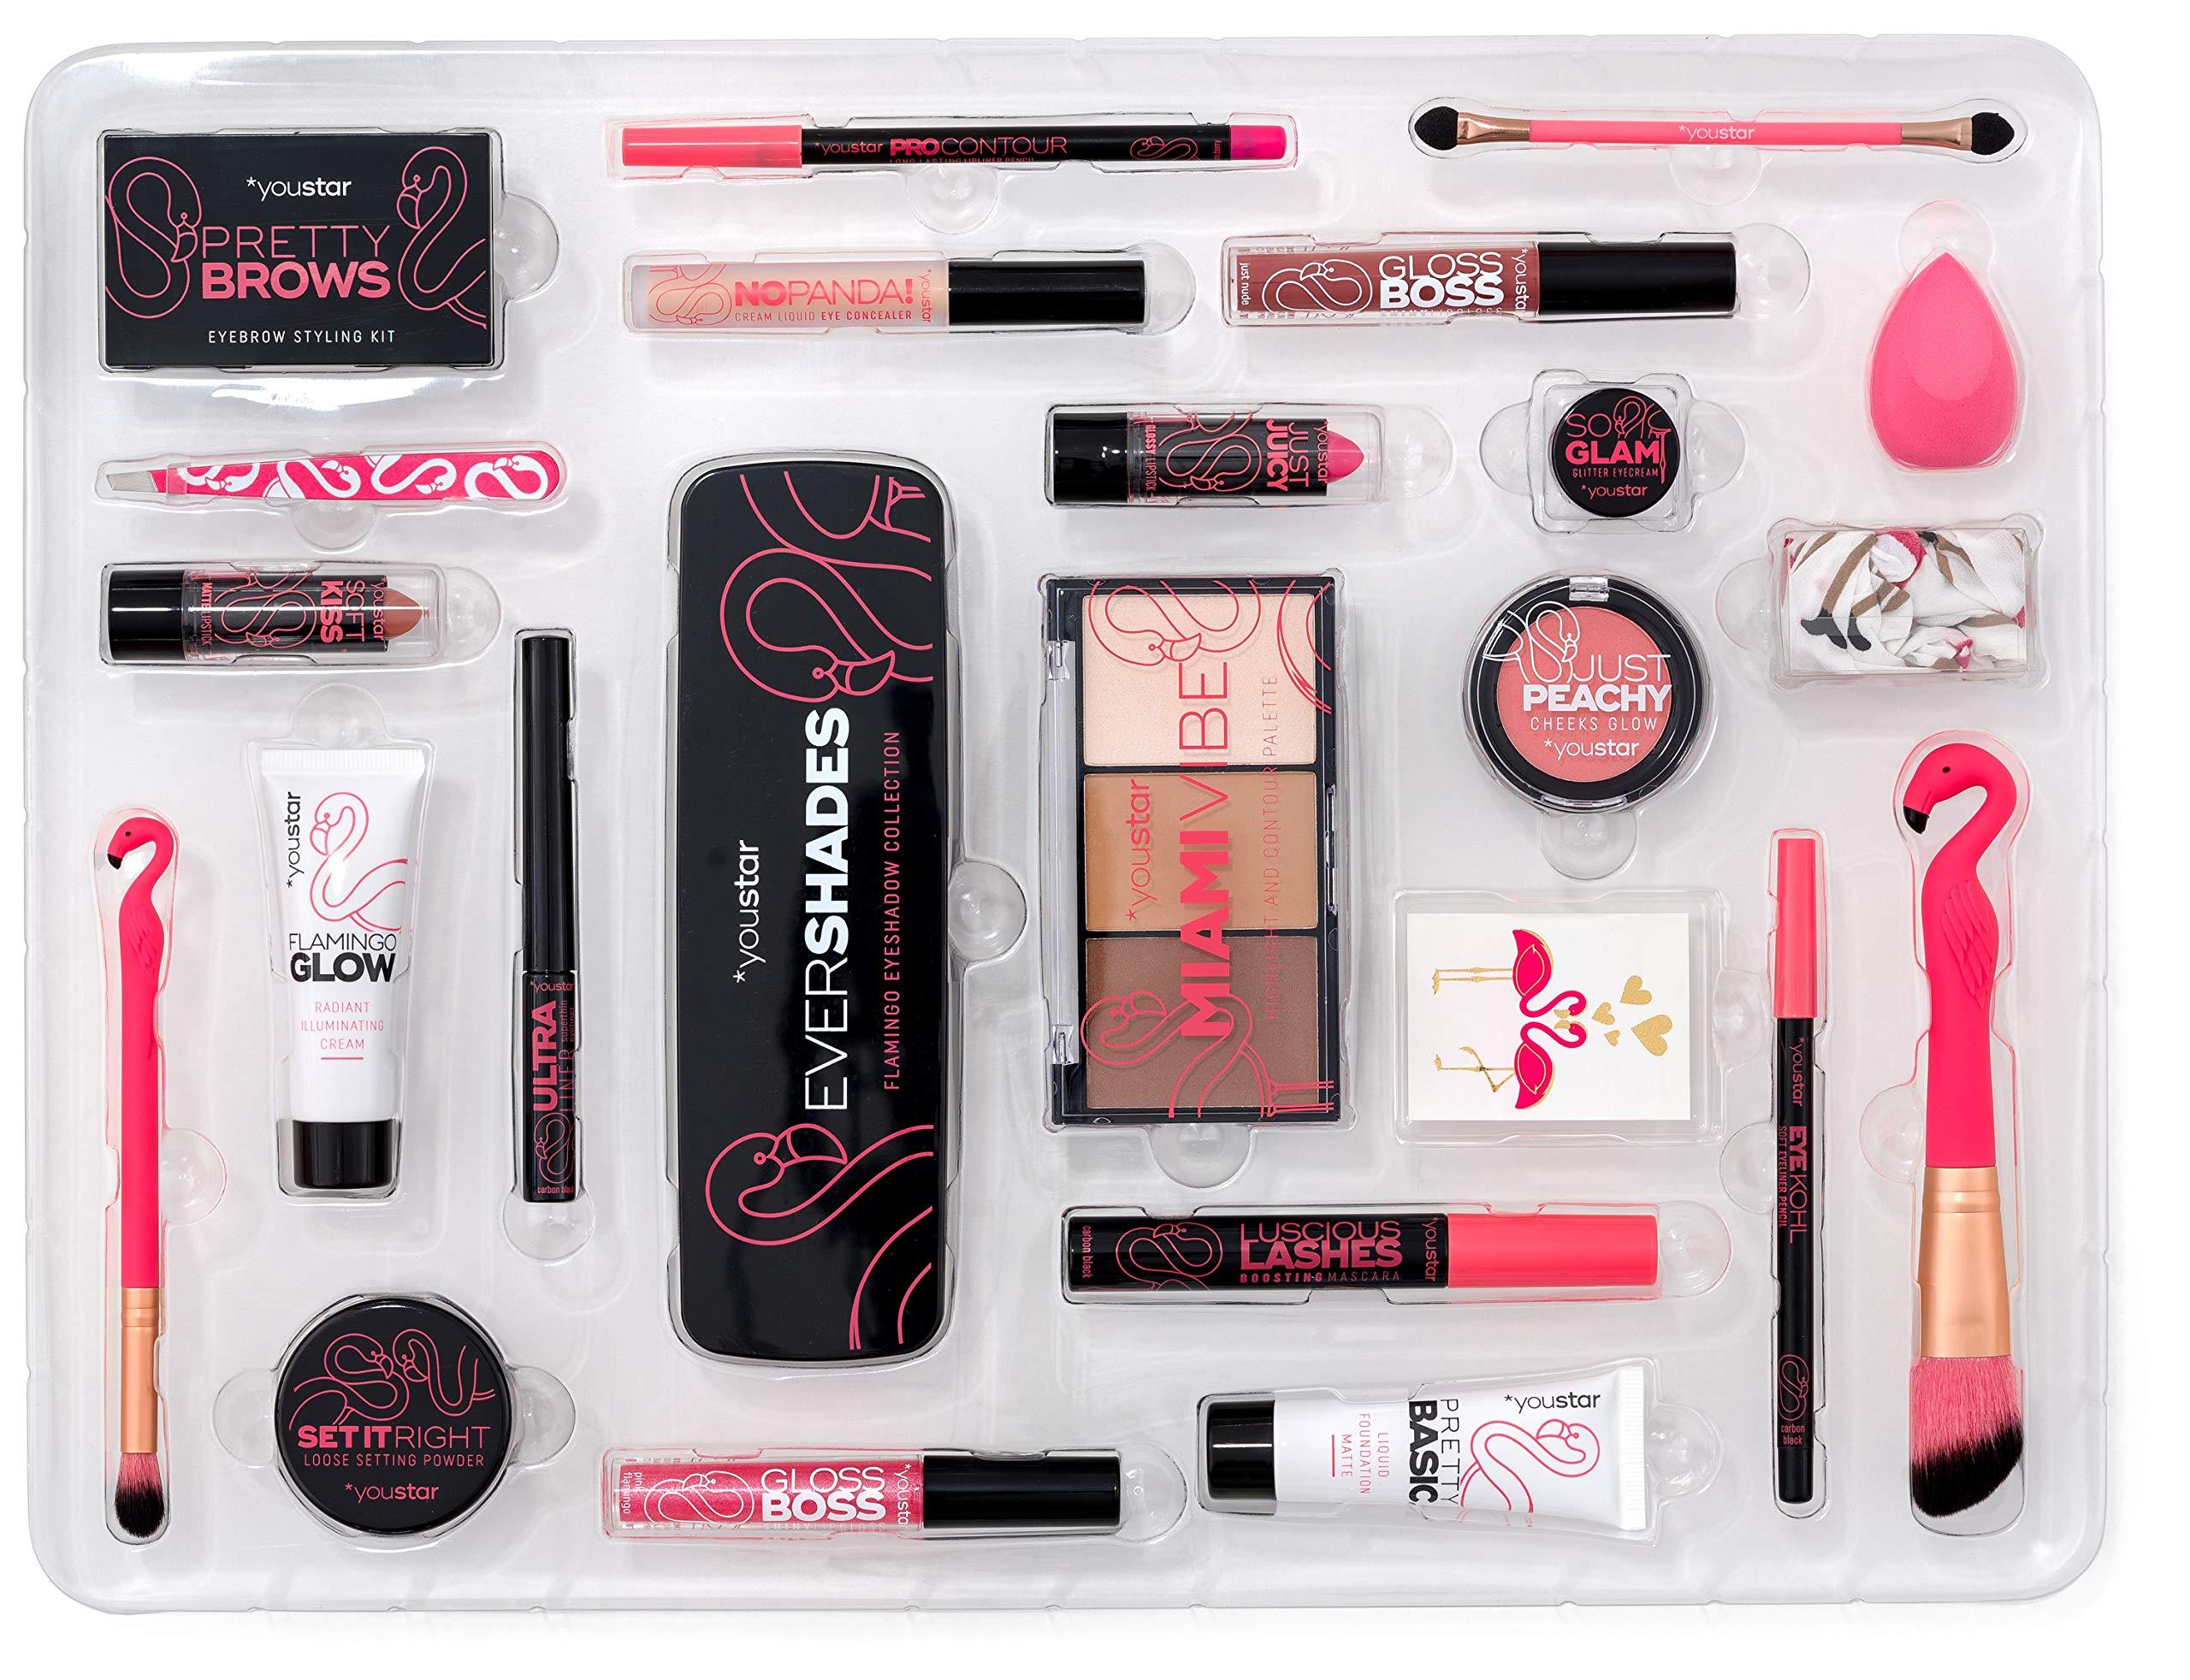 Make-up advent calendarPINK FLAMINGO X-MAS 2018, youstar